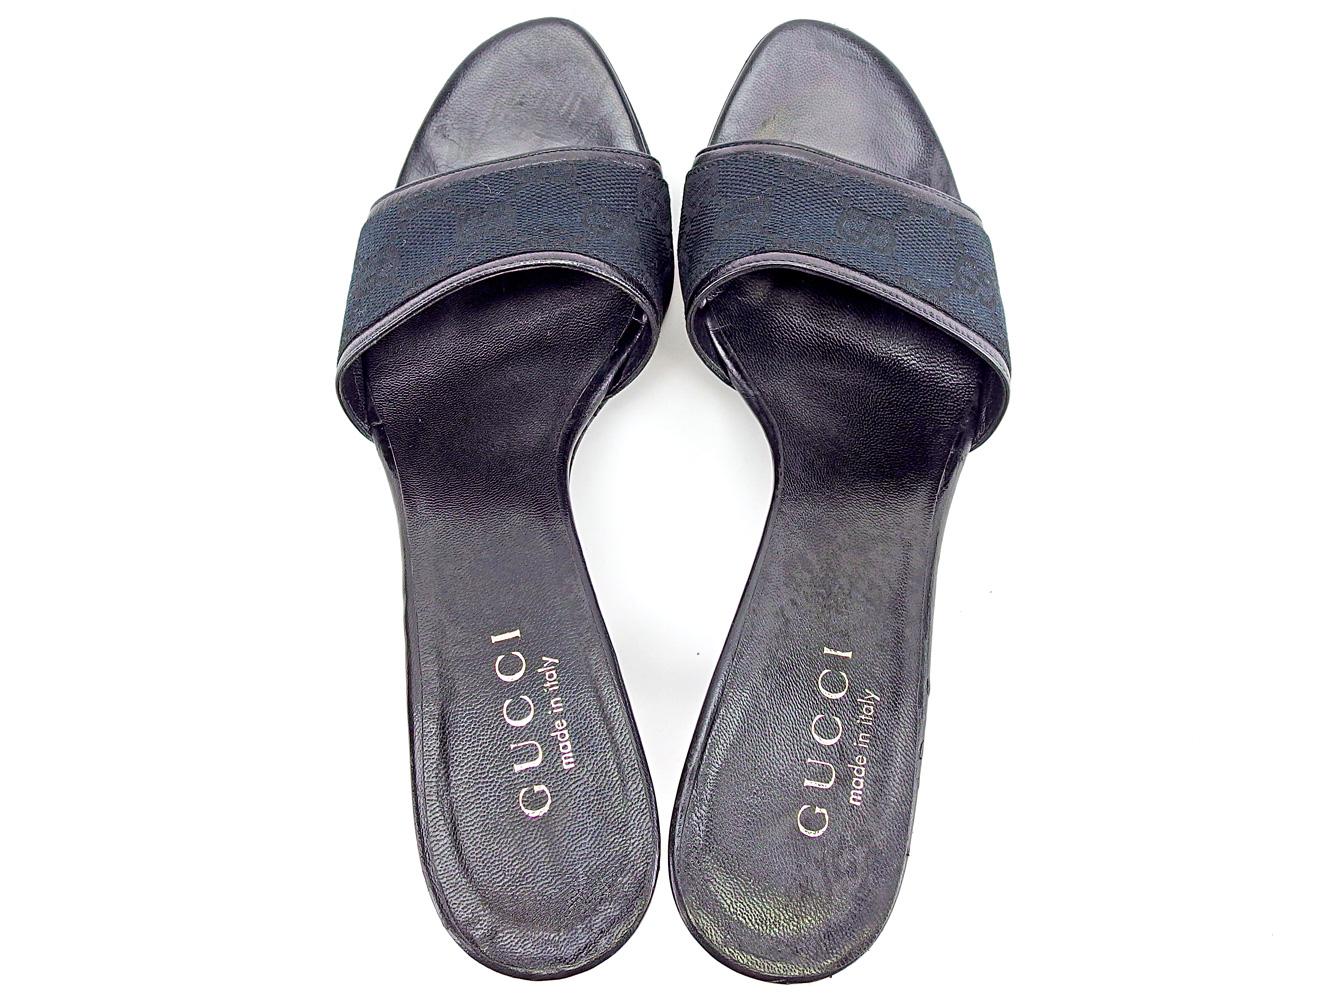 537fc0ac5 ... Gucci GUCCI mule sandals shoes shoes Lady's ♯ 35C pin heel GG canvas  black canvas X ...